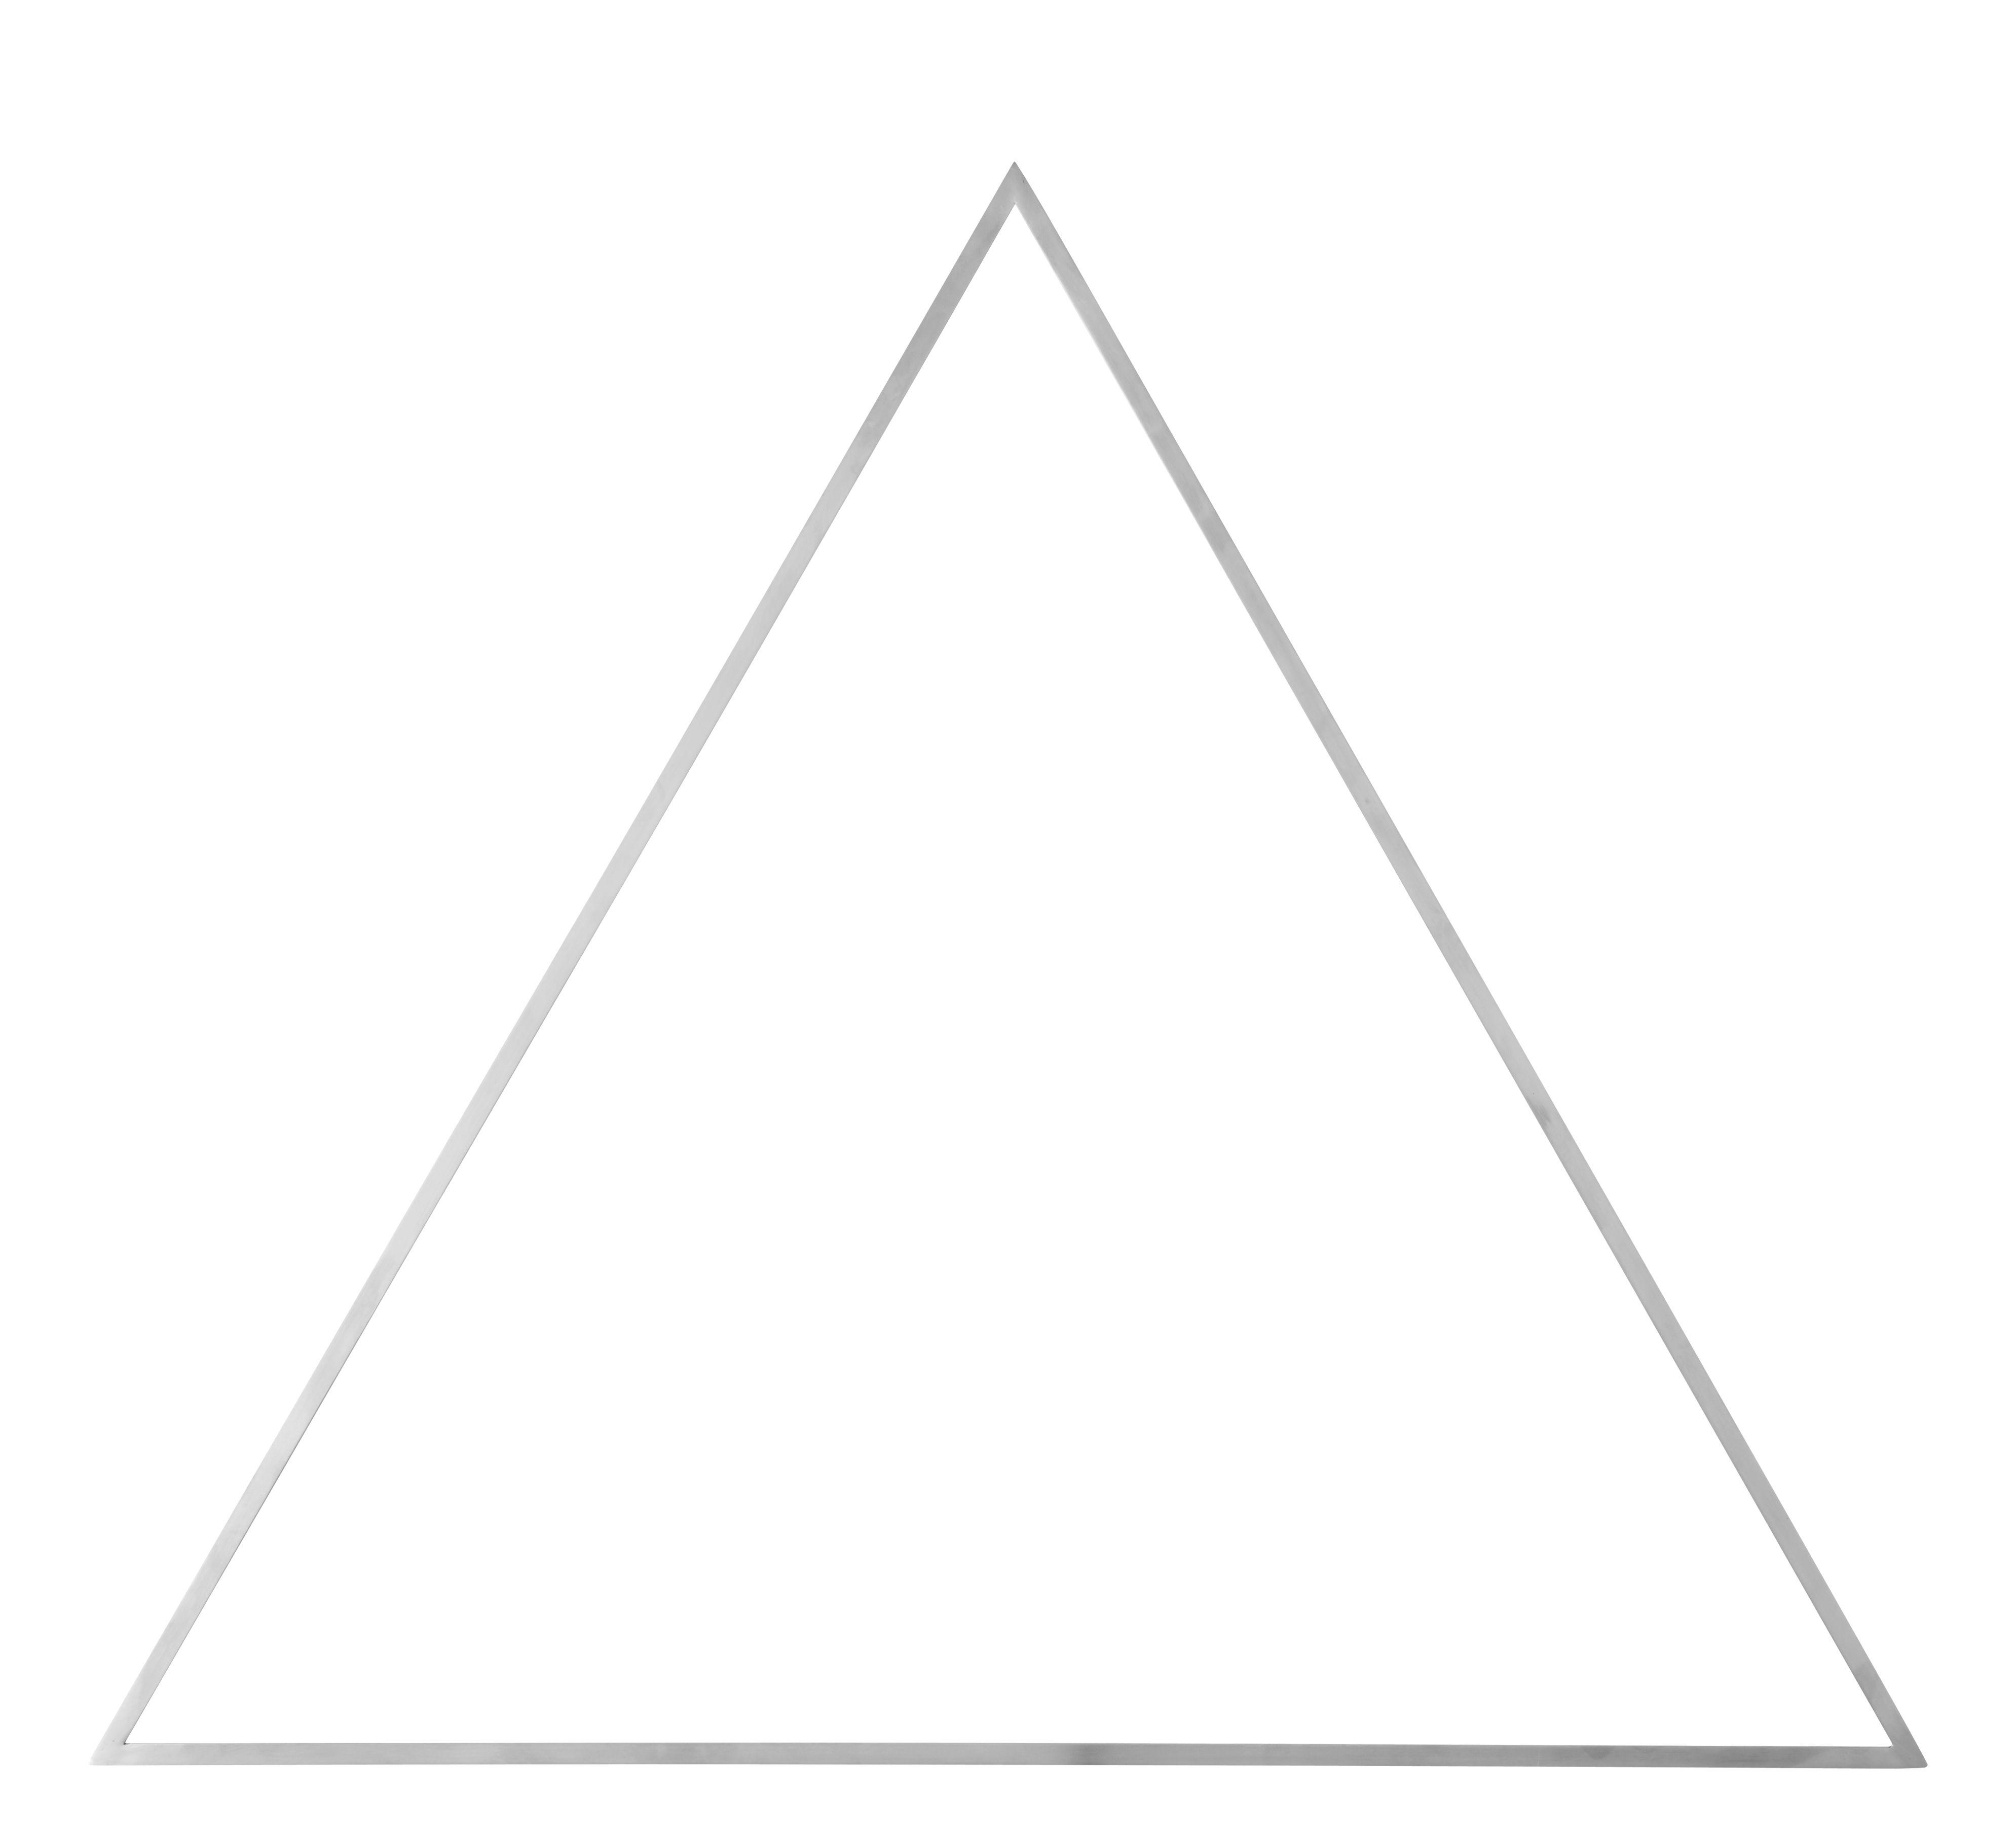 Dekoration - Dekorationsartikel - Still Triangle Dekoration / L 80 cm x H 69 cm - Metall - Menu - Stahl, gebürstet - gebürsteter rostfreier Stahl